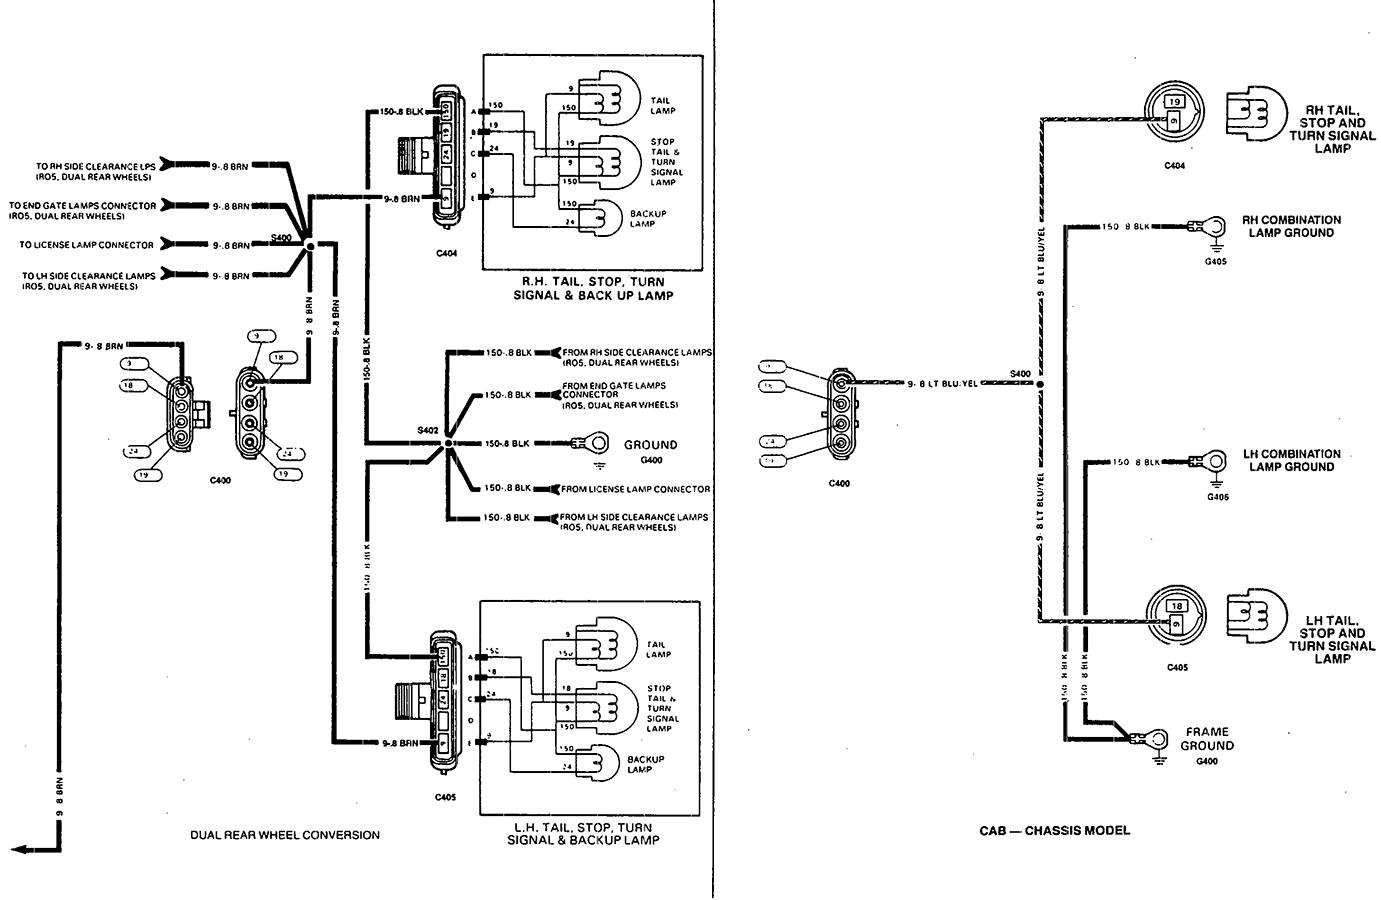 2005 Toyota Tacoma Tail Light Wiring Diagram Free Wiring Diagram